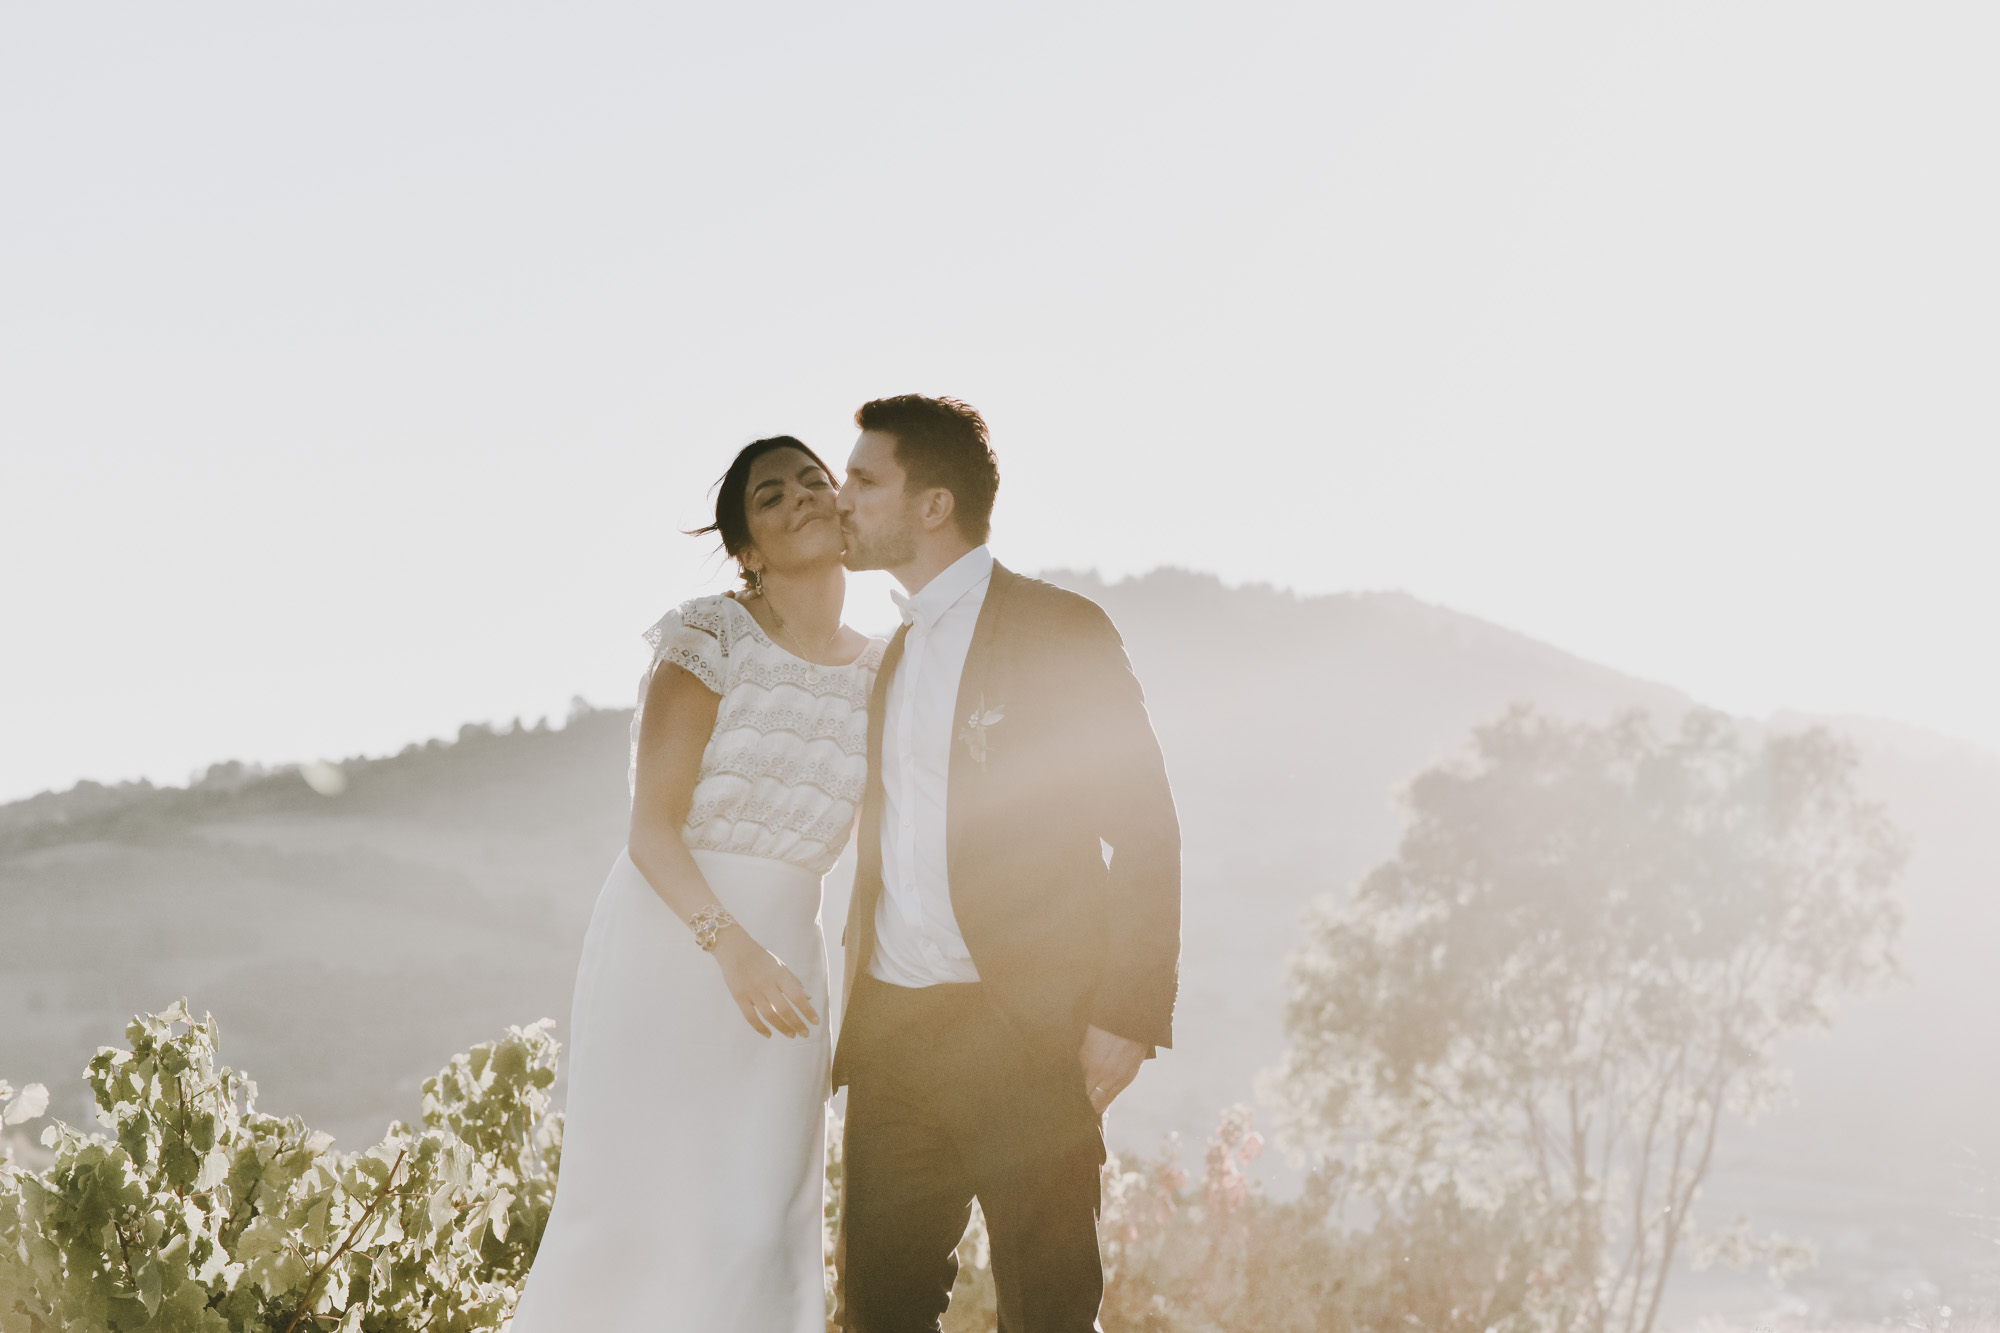 2018-09-08 - LD8_6155 - photographe mariage lyon - laurie diaz - www.lauriediazweeding.com.jpg